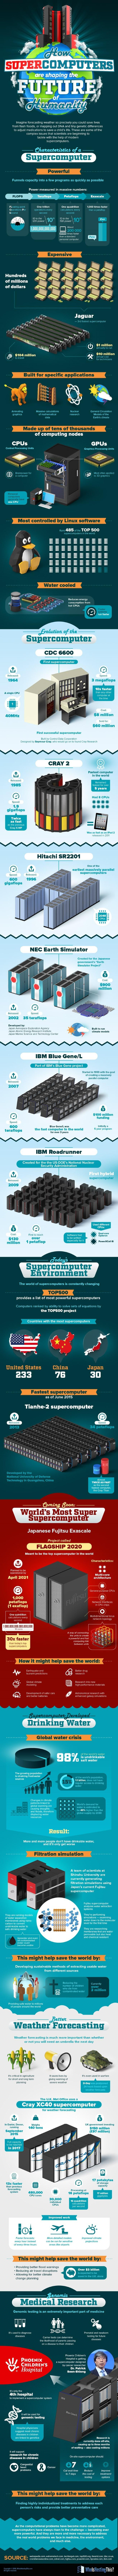 supercomputers